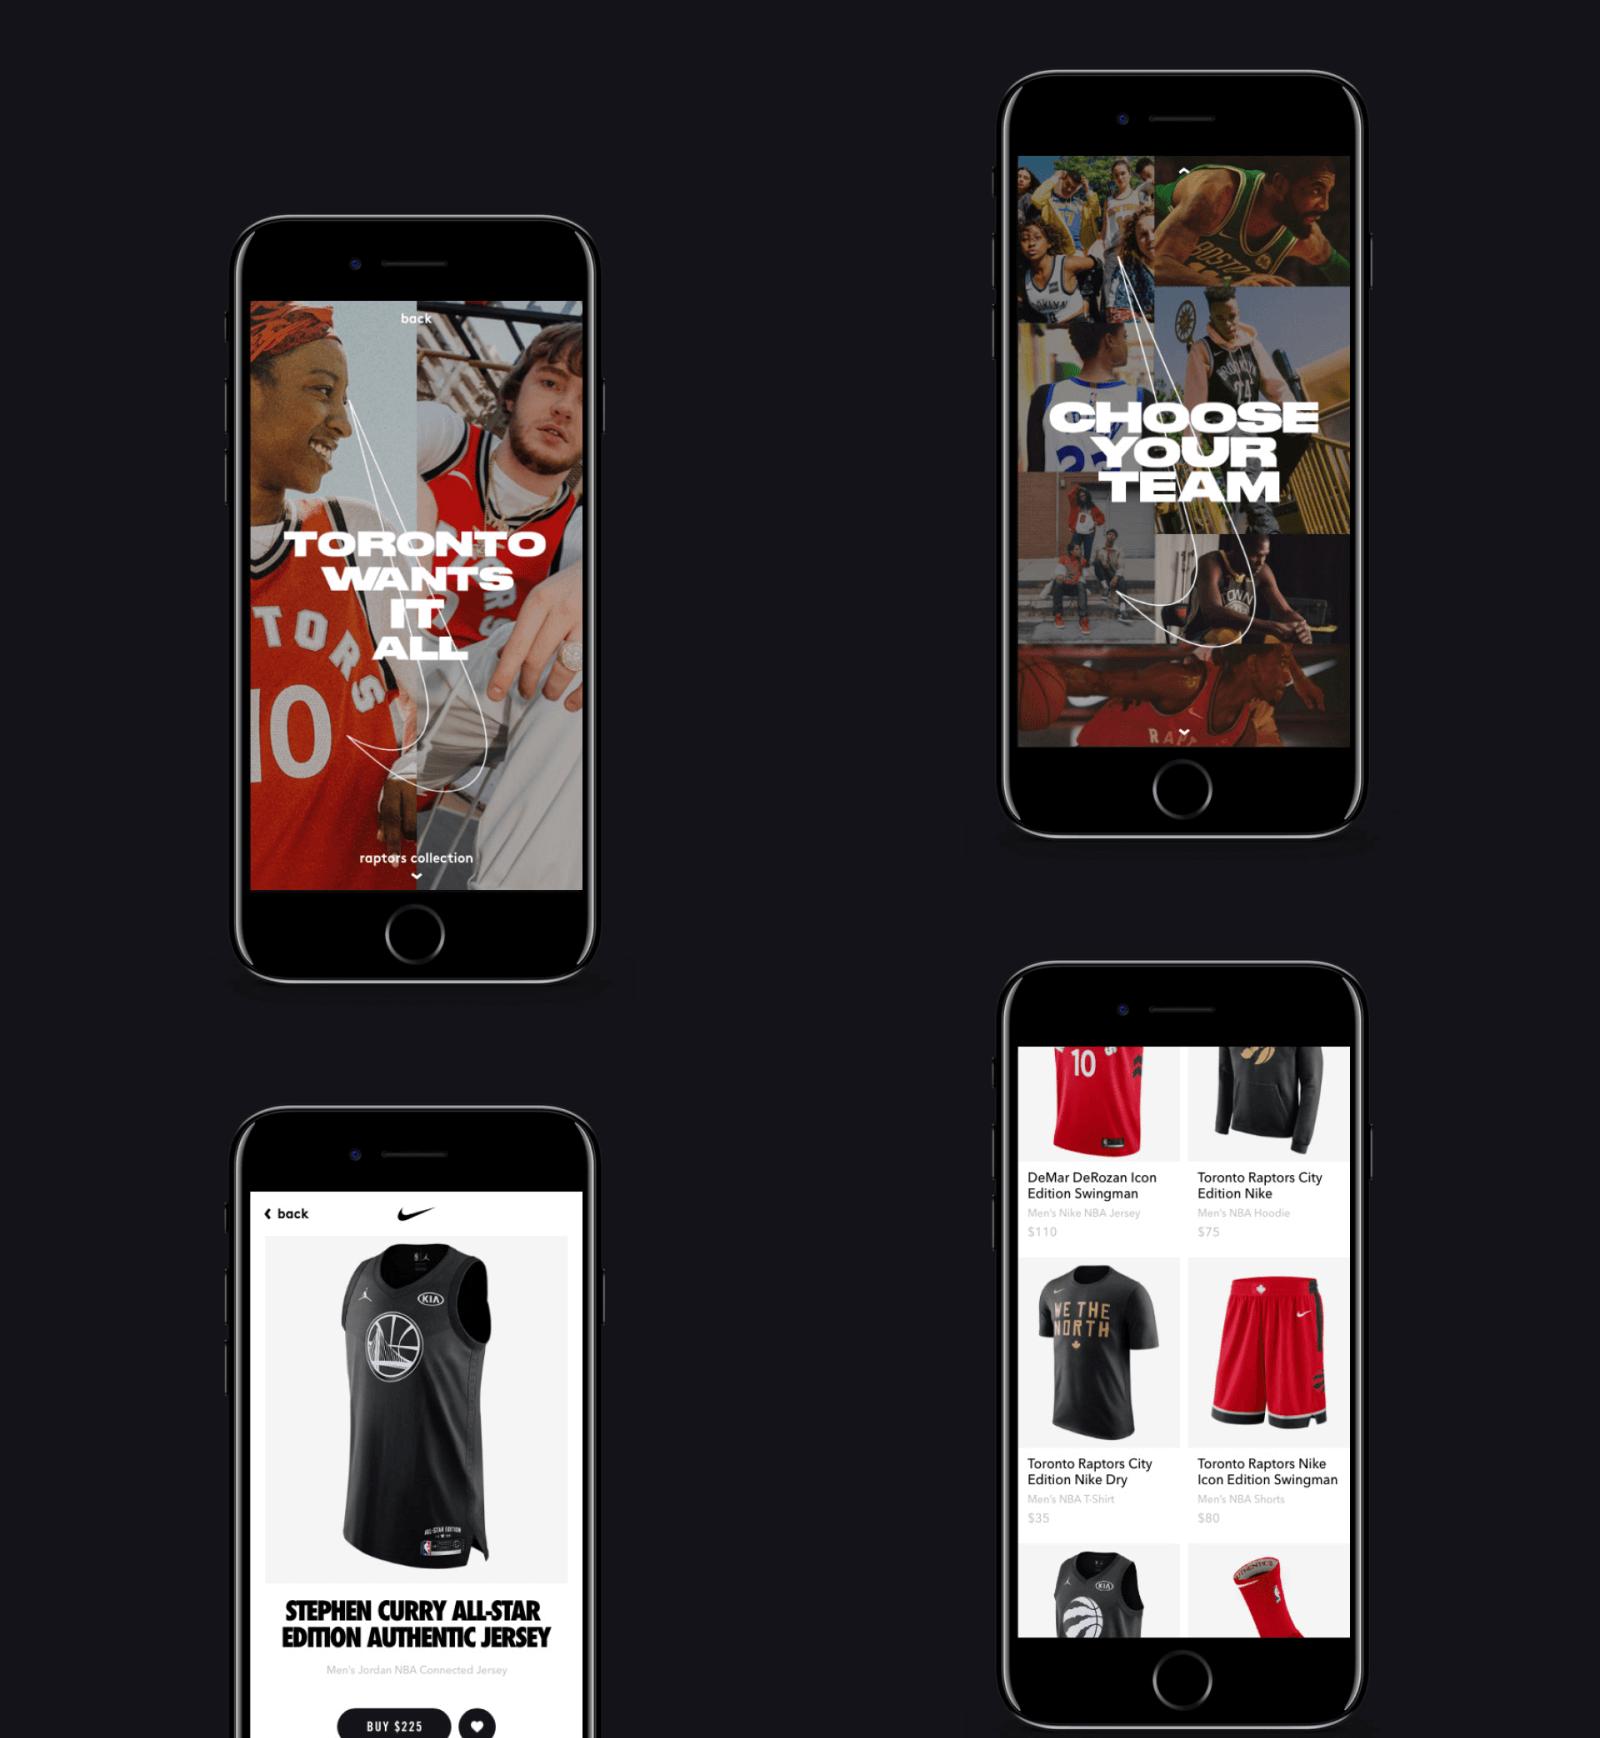 Nike x NBA mobile app - Shoe Detail (Project)